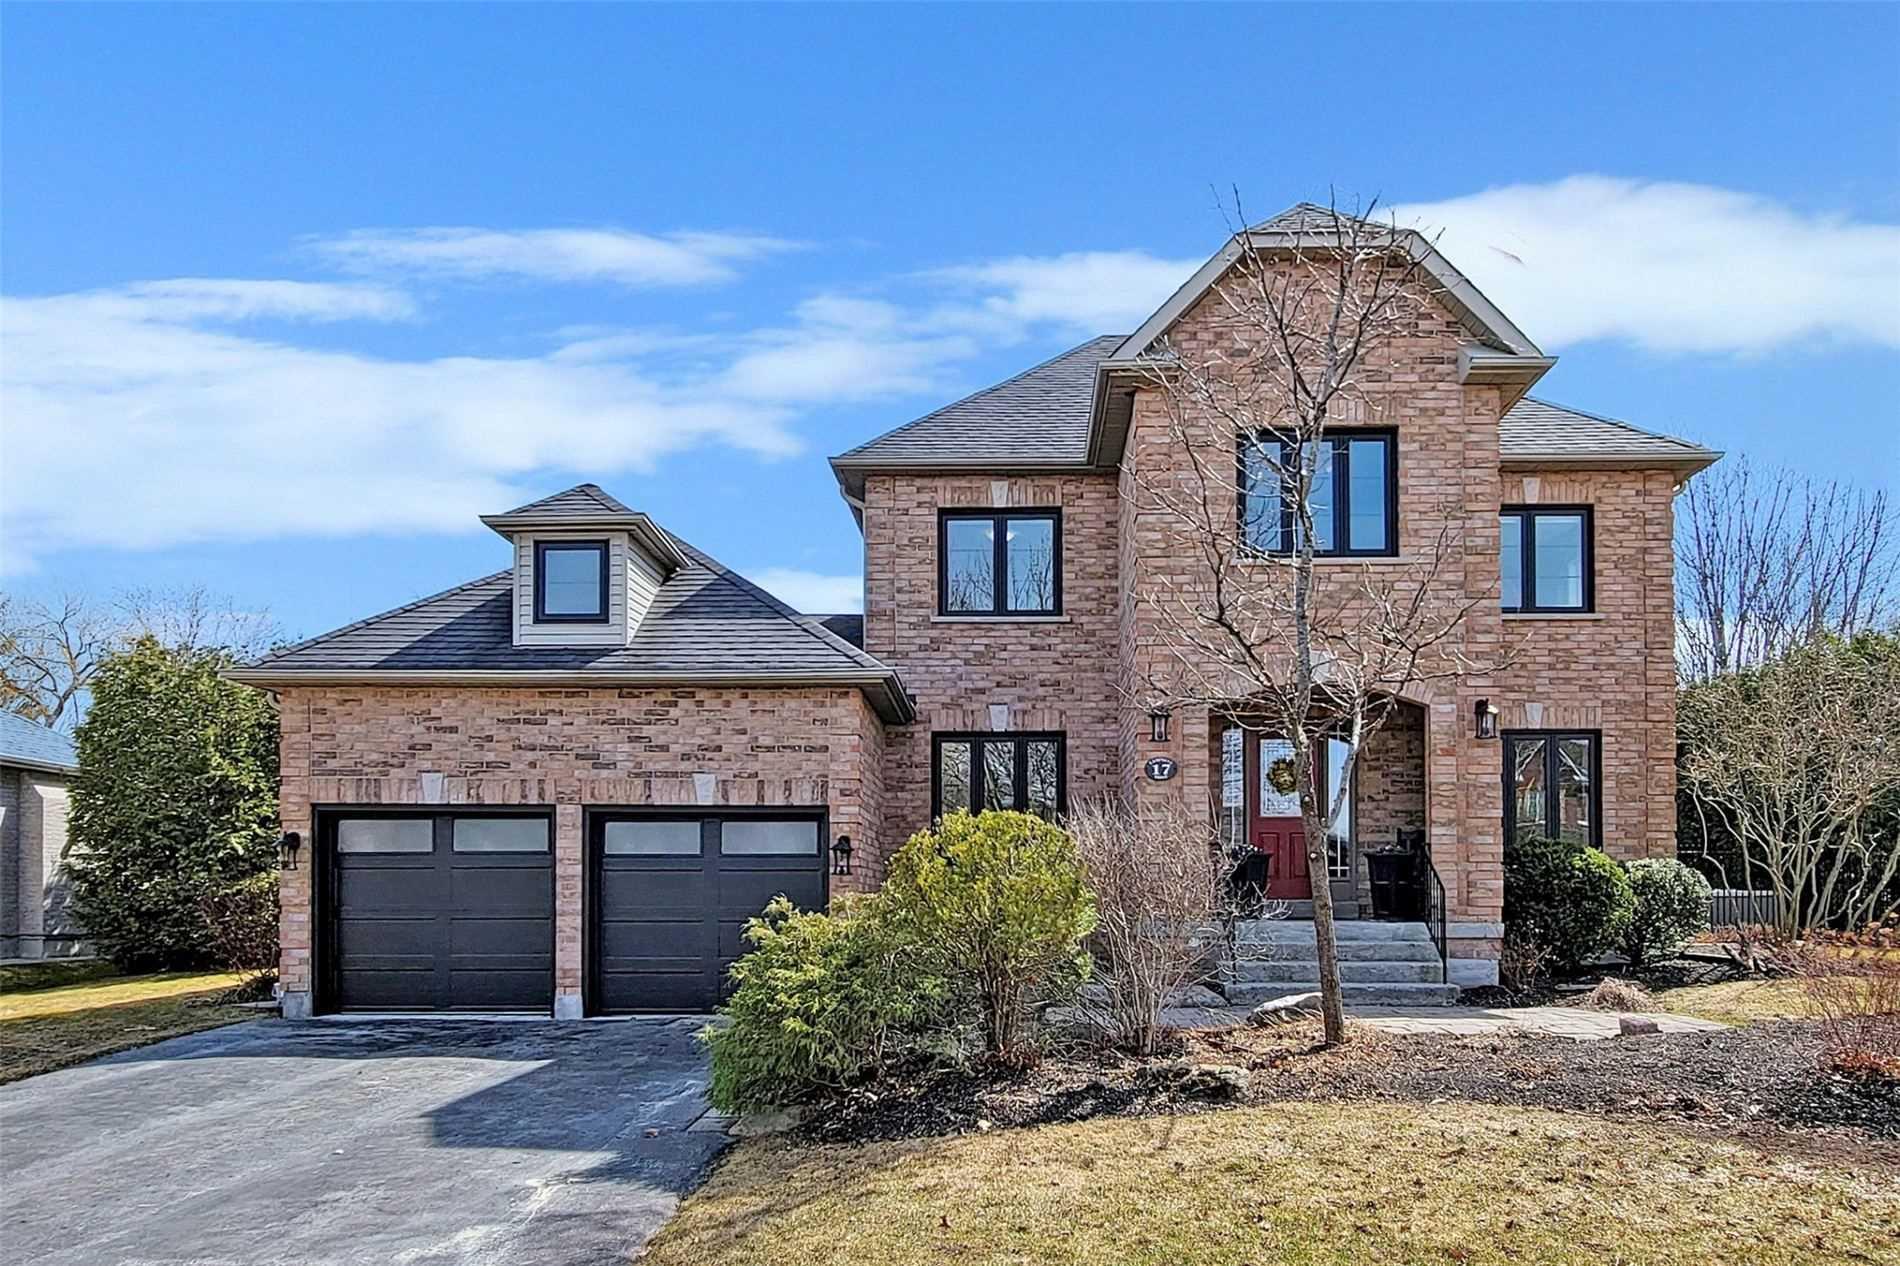 17 Campbell Dr, Uxbridge, Ontario L9P 1R5, 4 Bedrooms Bedrooms, ,4 BathroomsBathrooms,Detached,For Sale,Campbell,N5168560